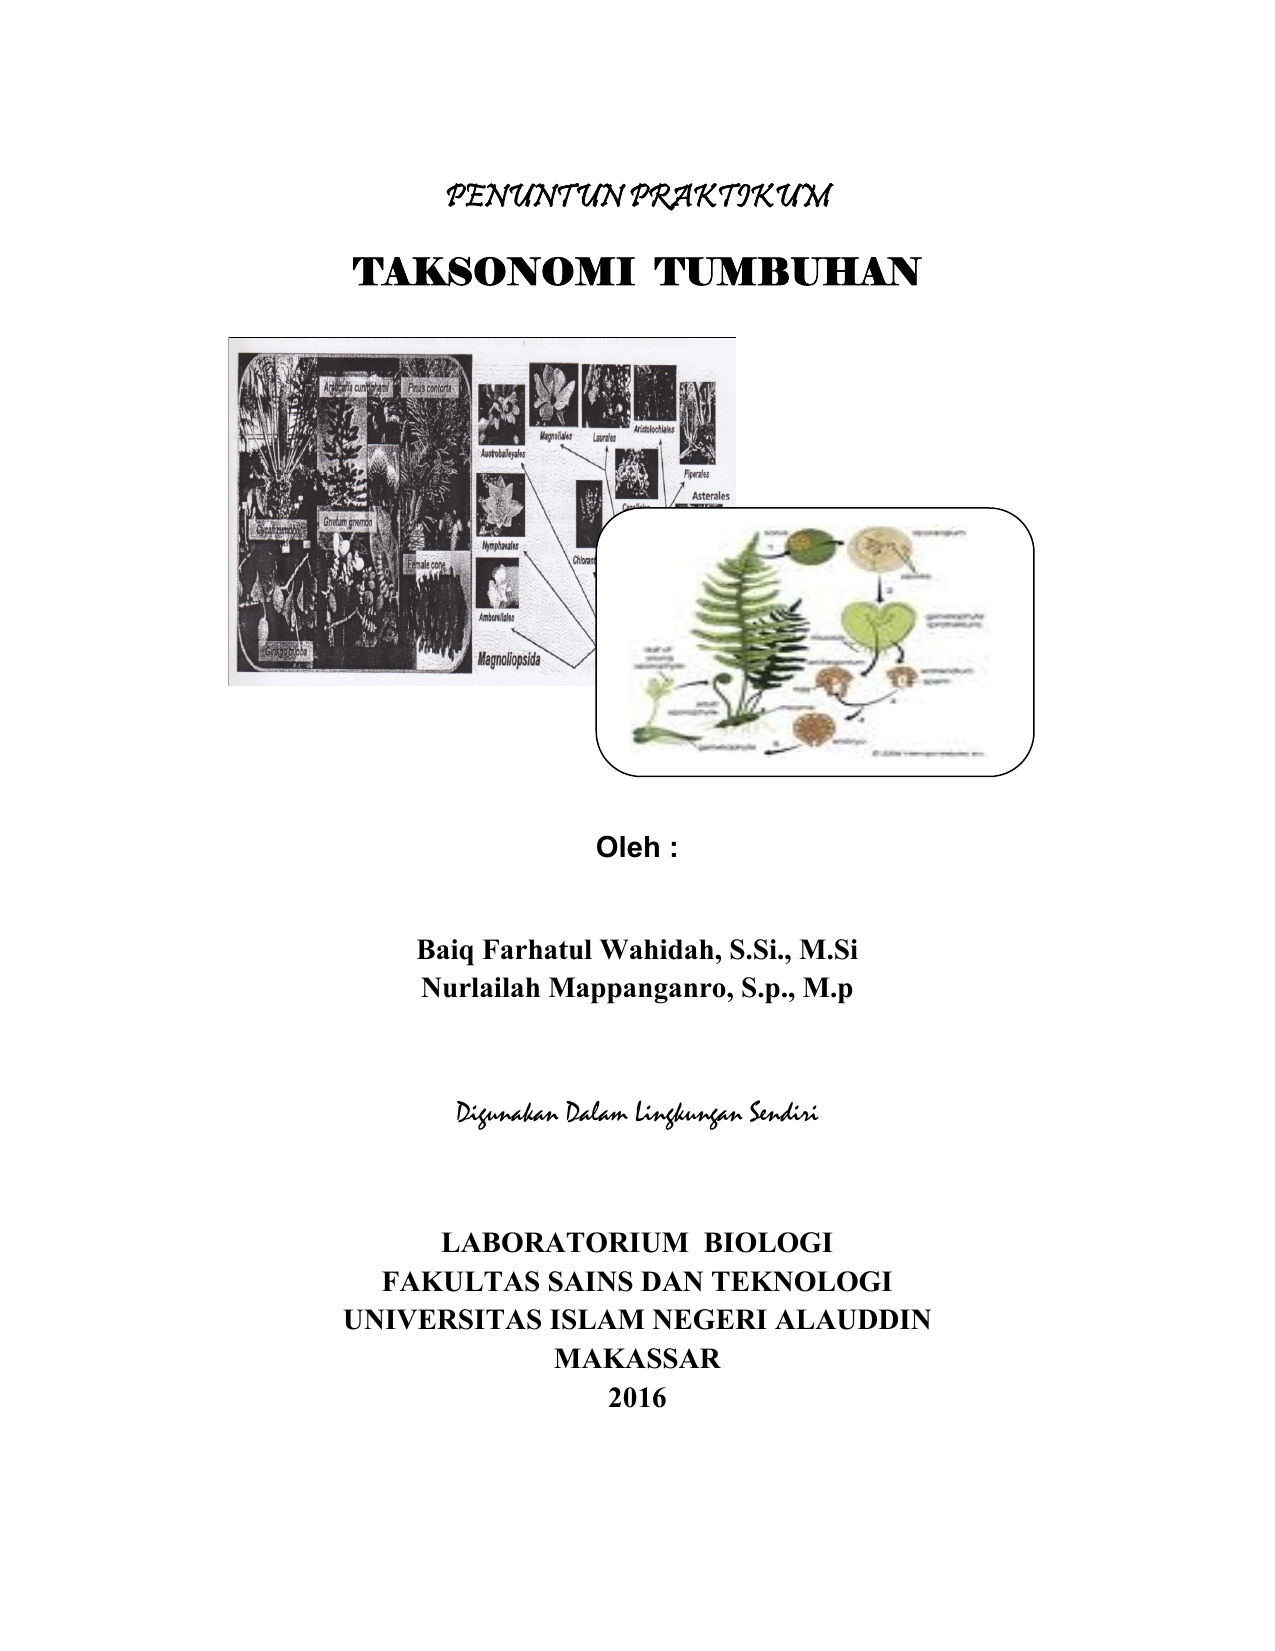 Taksonomi tumbuhan biologi uin alauddin makassar ccuart Choice Image